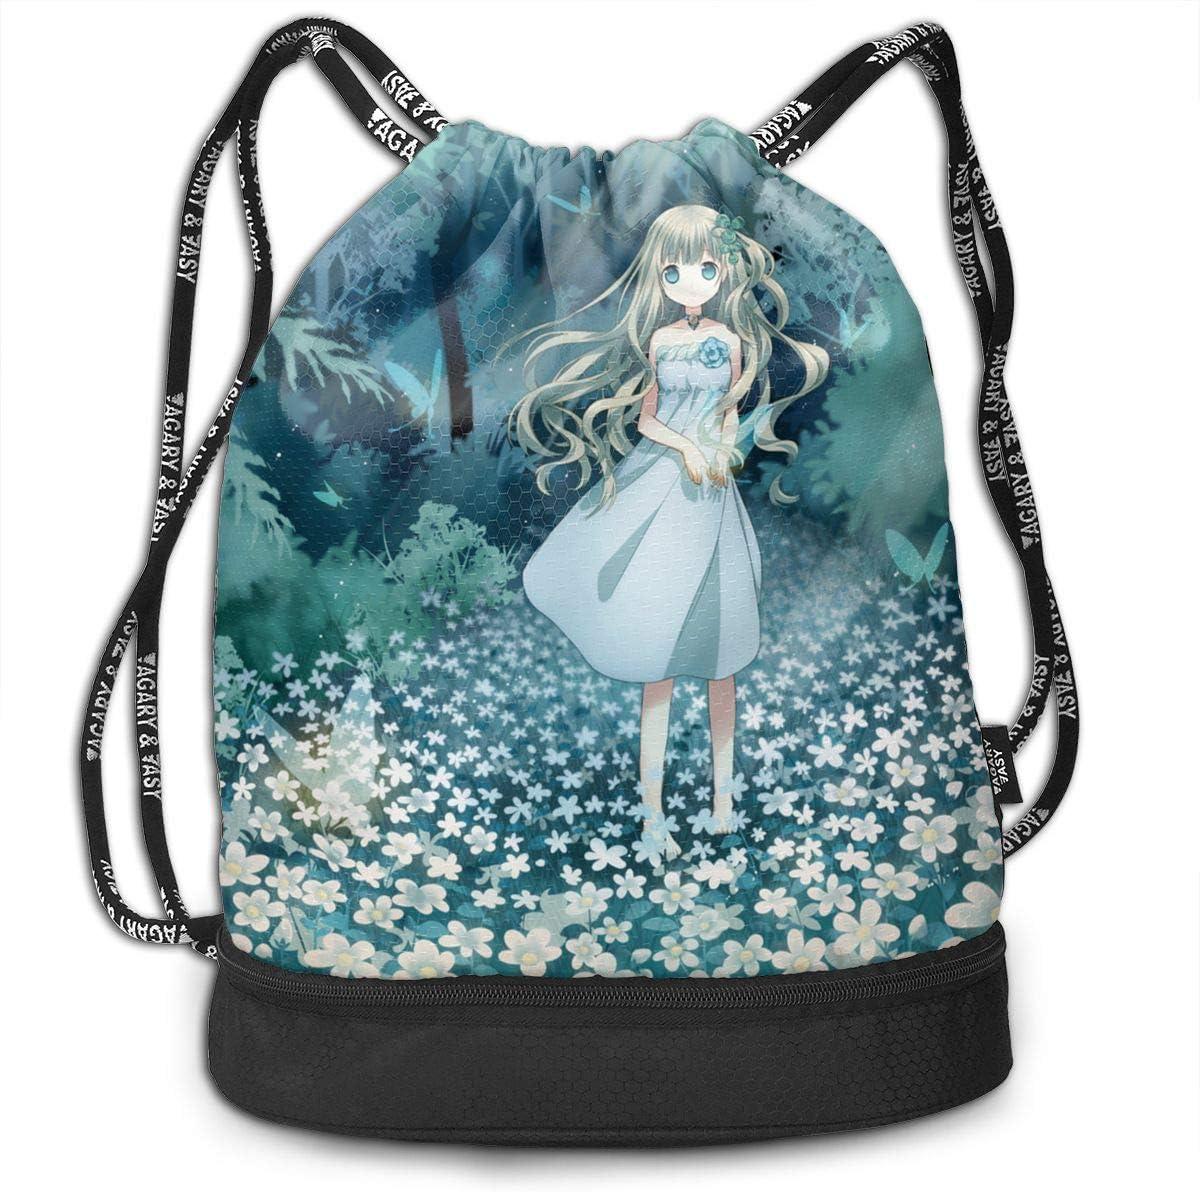 HUOPR5Q Anime Flower Girl Drawstring Backpack Sport Gym Sack Shoulder Bulk Bag Dance Bag for School Travel